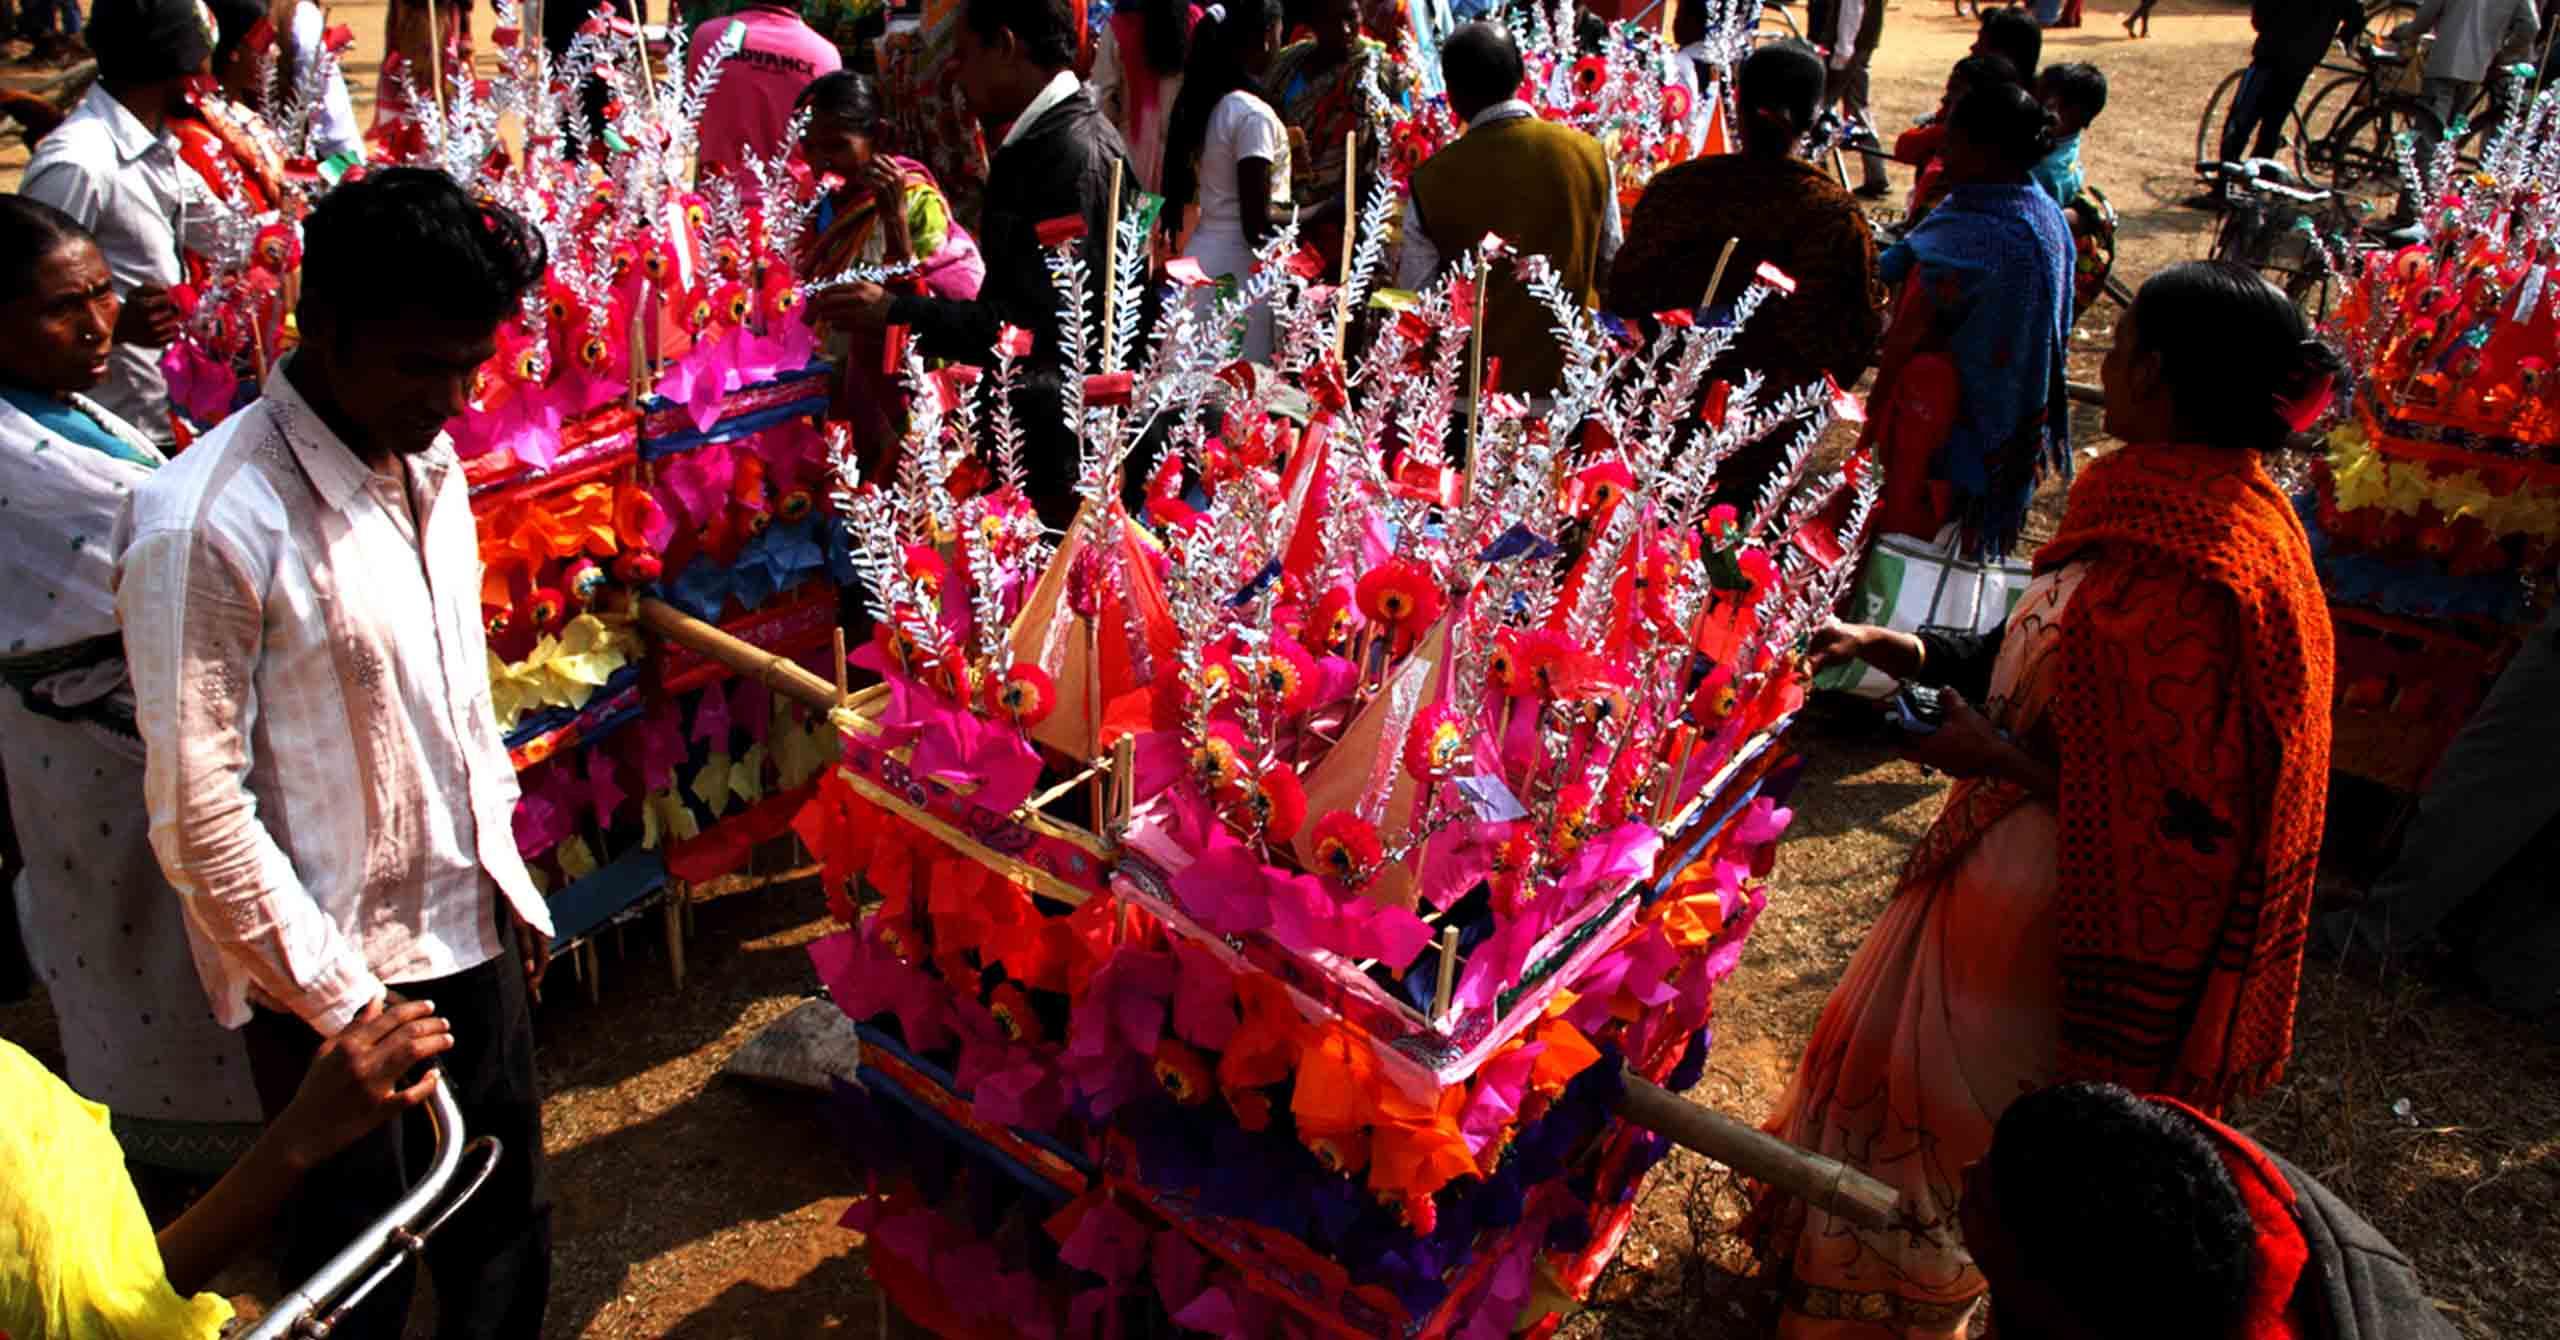 Tusu festival, celebration of harvest season involving the worship of the Goddess Tusu